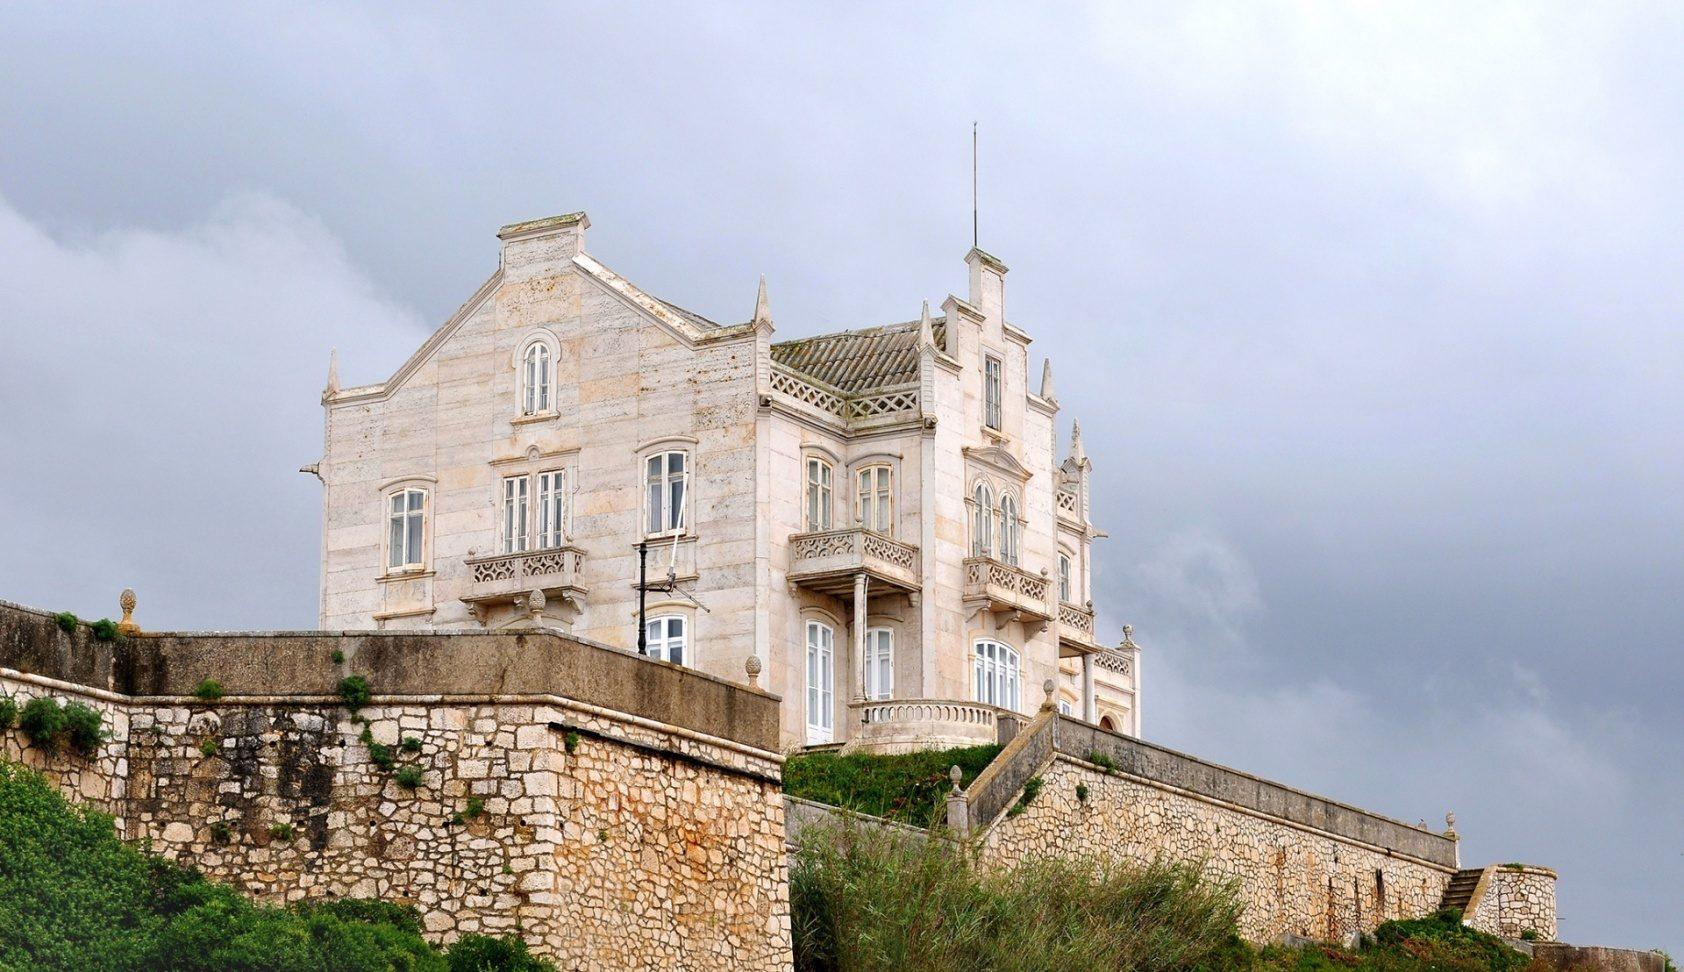 Interior Design Project: A Lisbon Palace Renovation interior design project Interior Design Project: A Portuguese Palace Renovation 6165391 e1586946539502